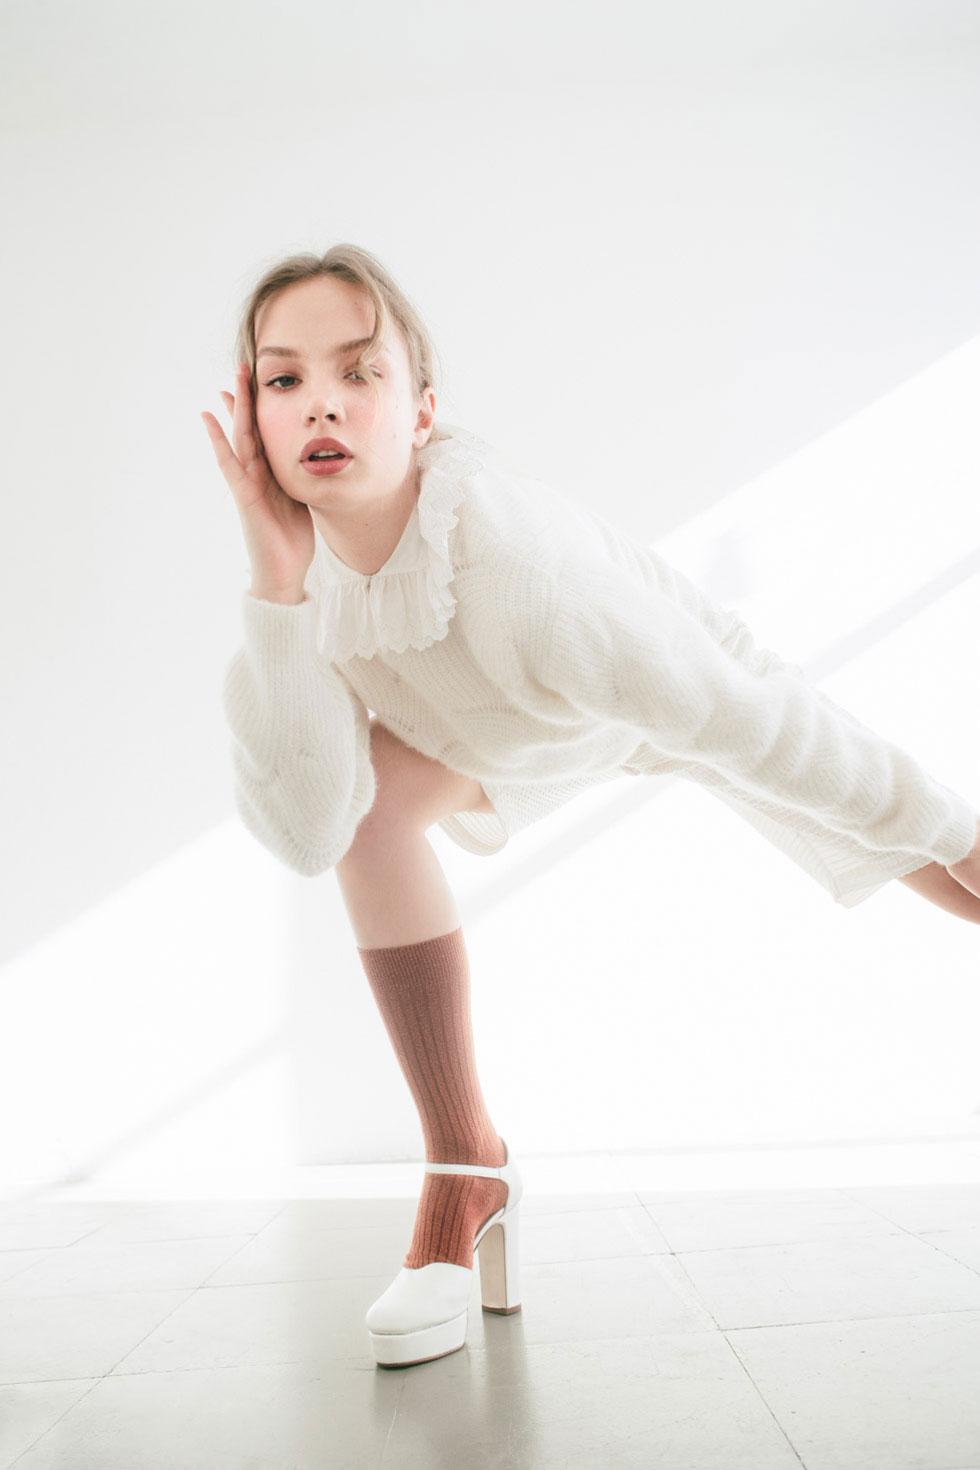 The Forest Shoes & L'Arca & Floral Atelier